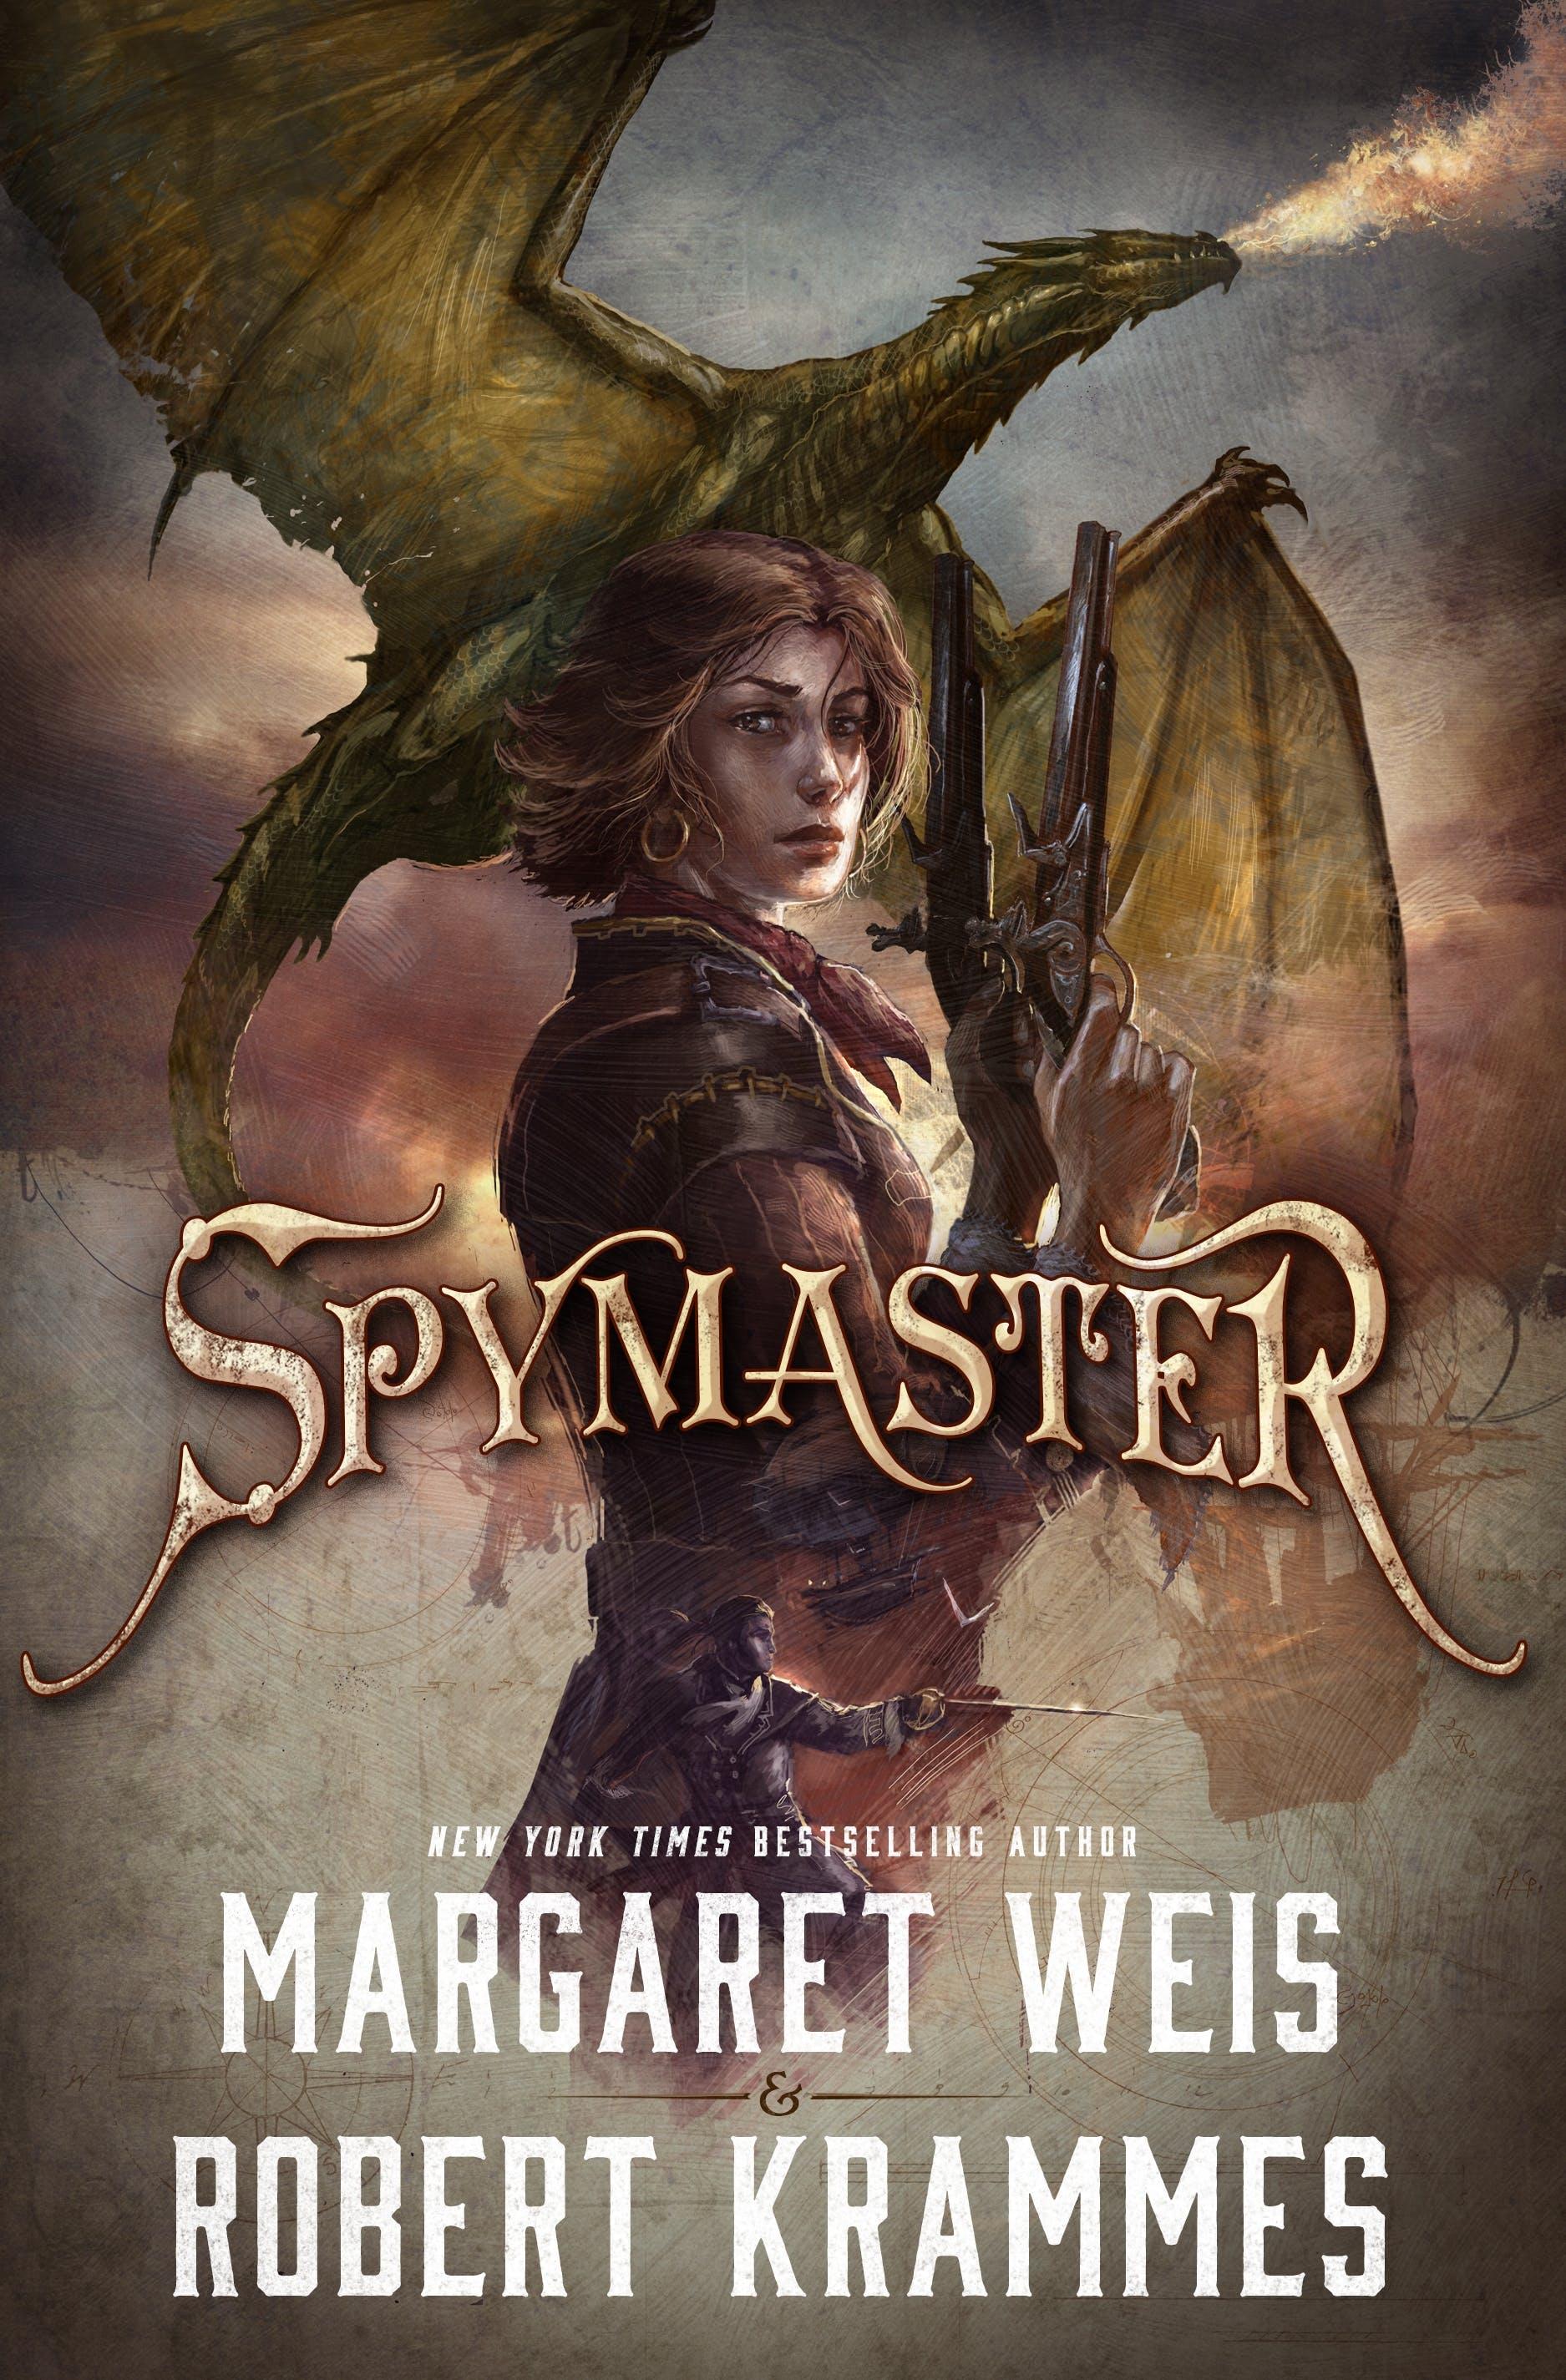 Image of Spymaster